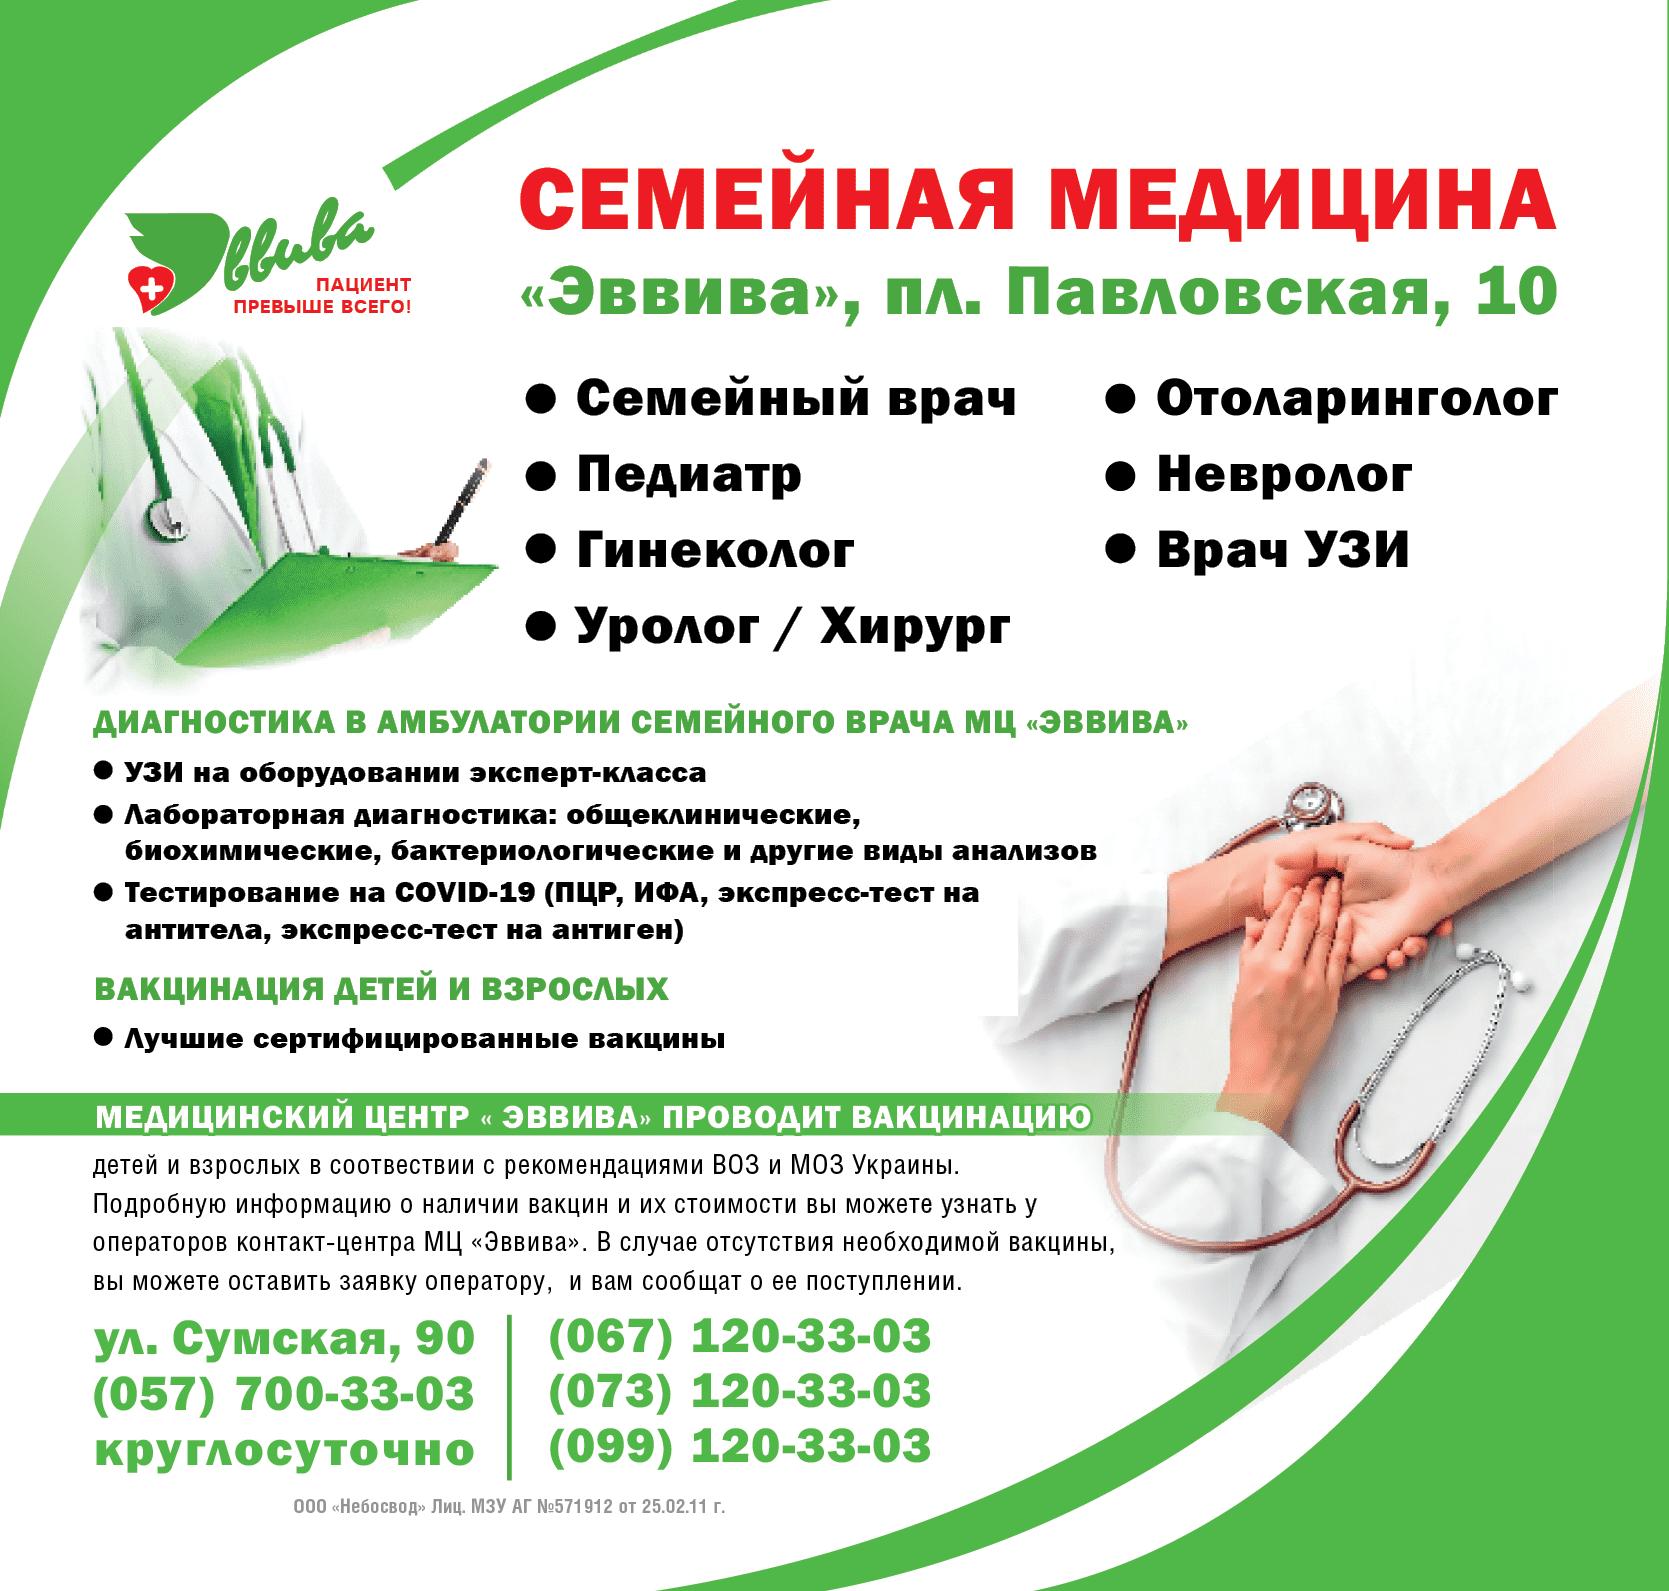 evviva-zhurnal-118-page28